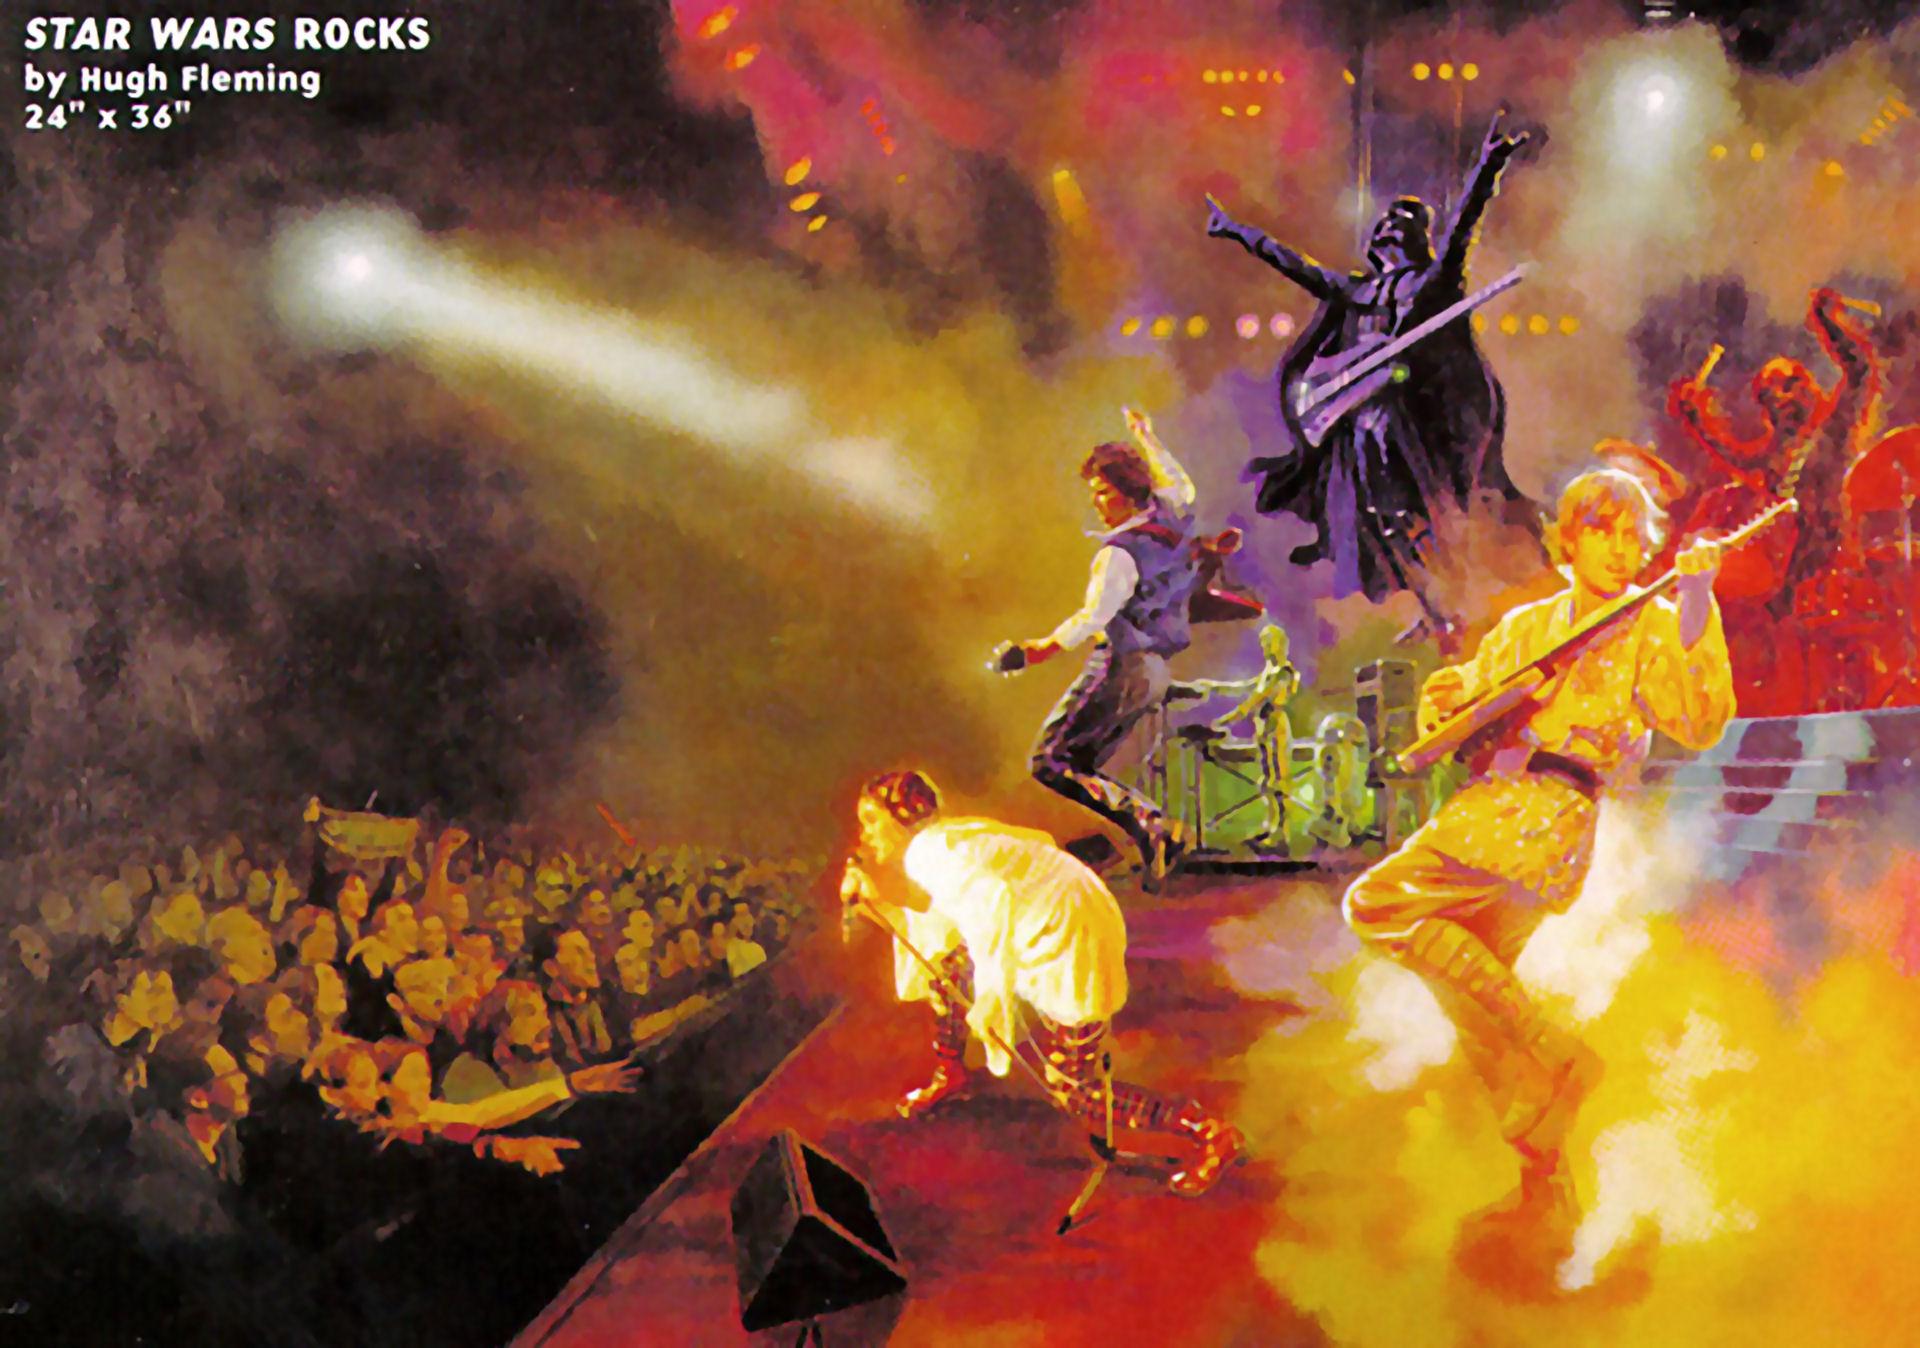 star-wars-rocks-1.jpg